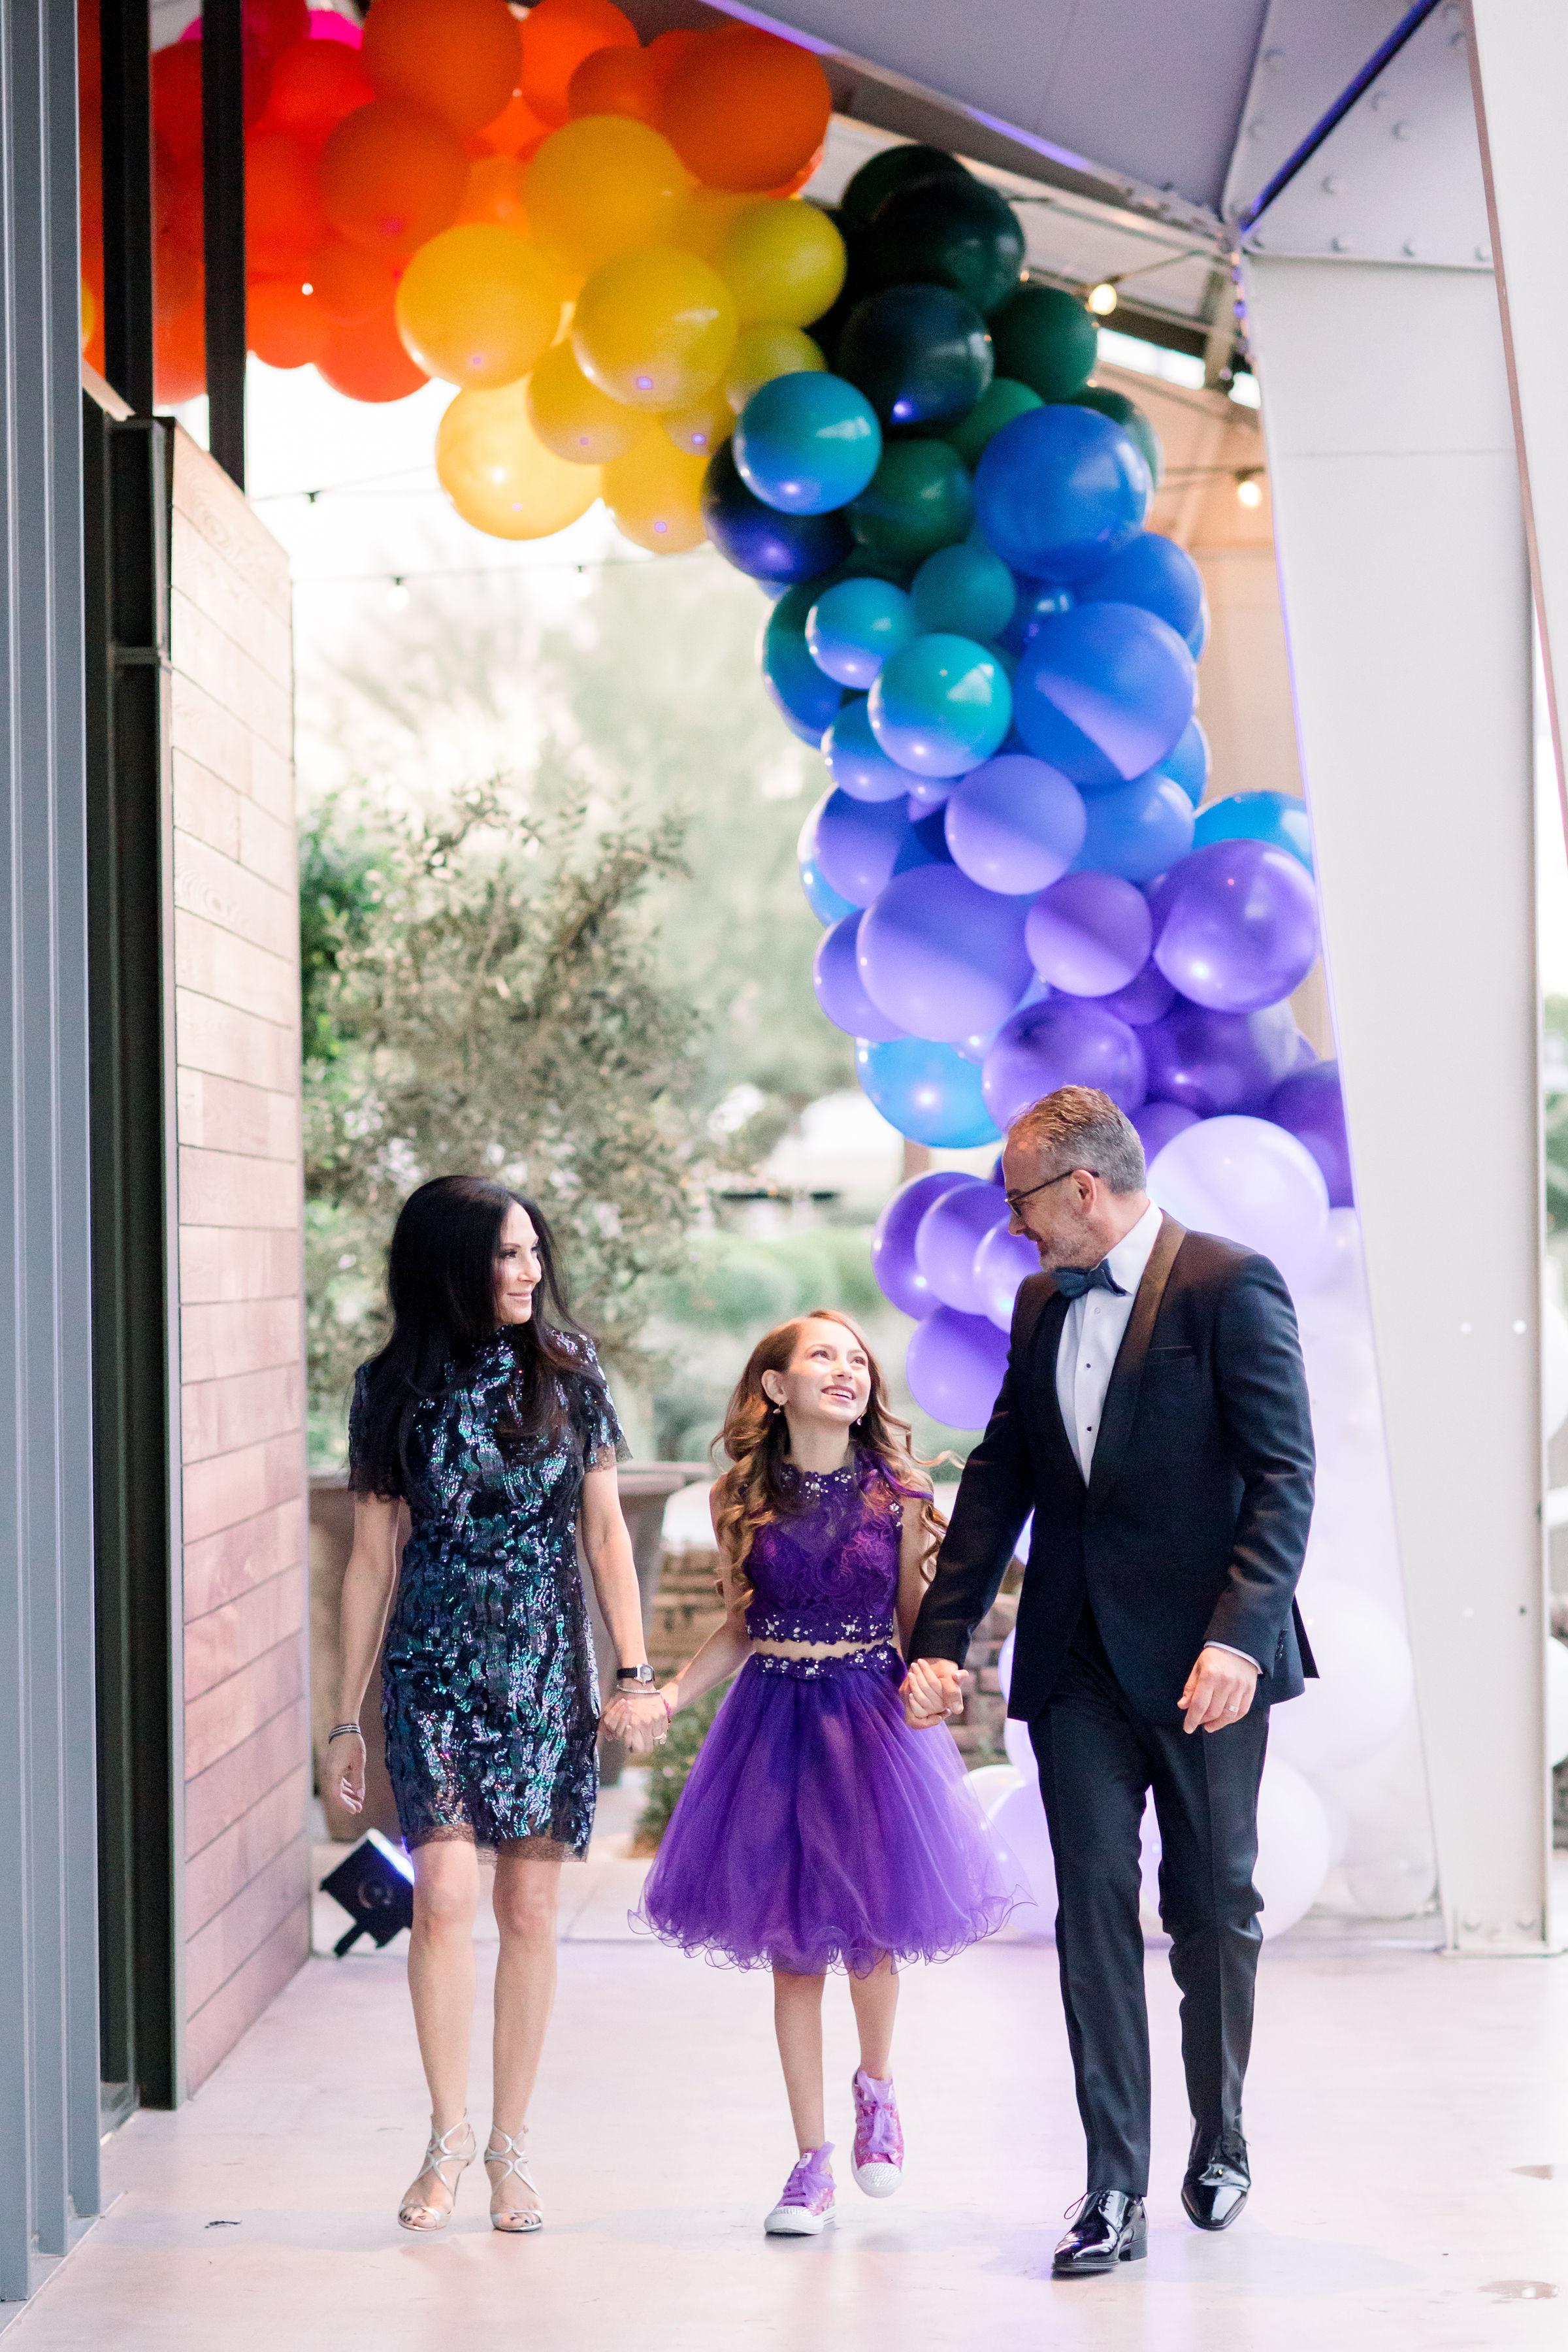 19 rainbow balloon arch rainbow bat mitzvah purple tulle skirt sequin dress bat mitzvah family Life Design Events photos by Stephanie Heymann Photography.jpg